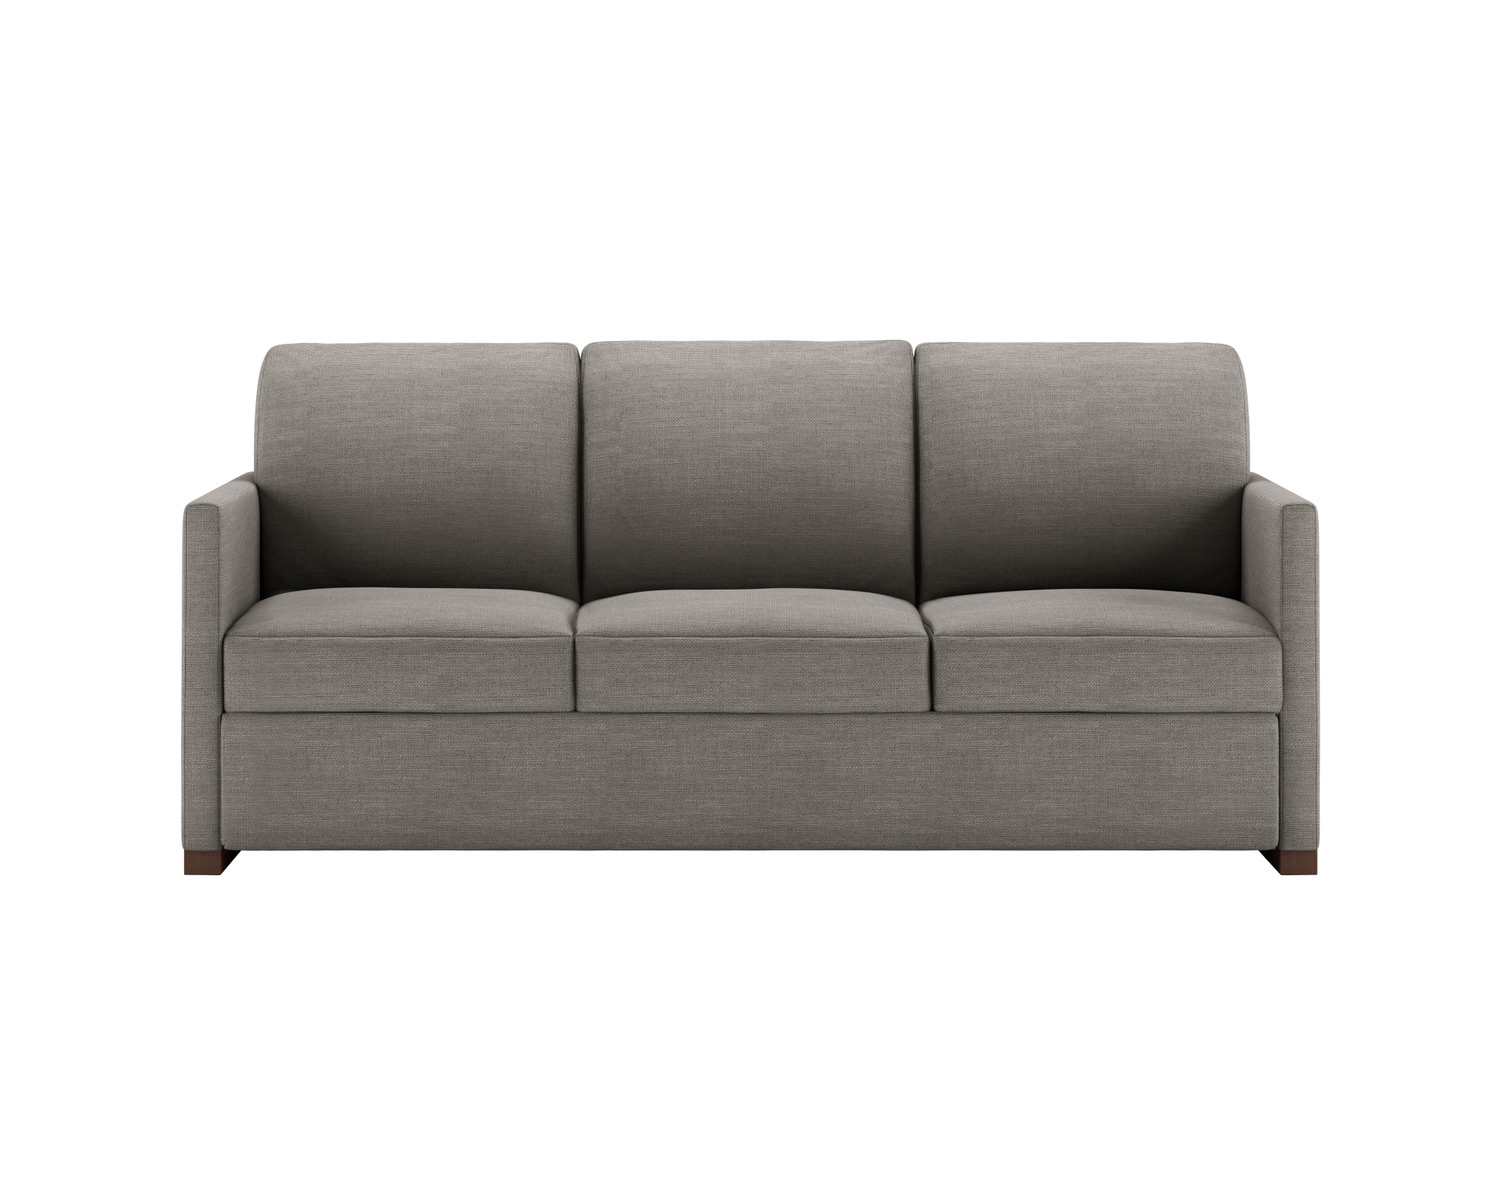 - Pearson Convertible Comfort Sleeper® Sofa Bedrooms & More, Seattle